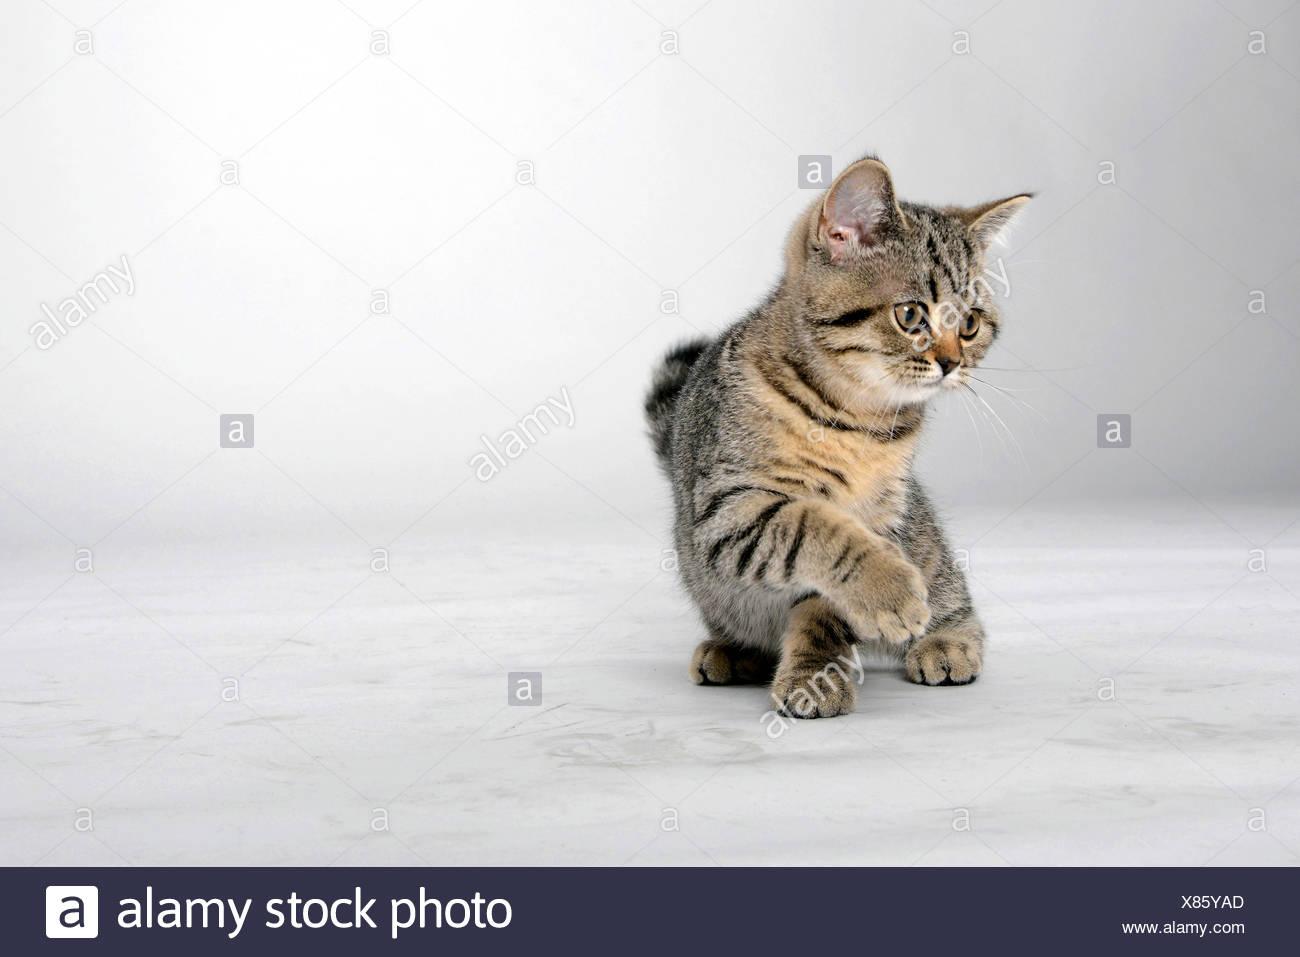 British Shorthair (Felis silvestris f. catus), little striped kitten giving the paw - Stock Image